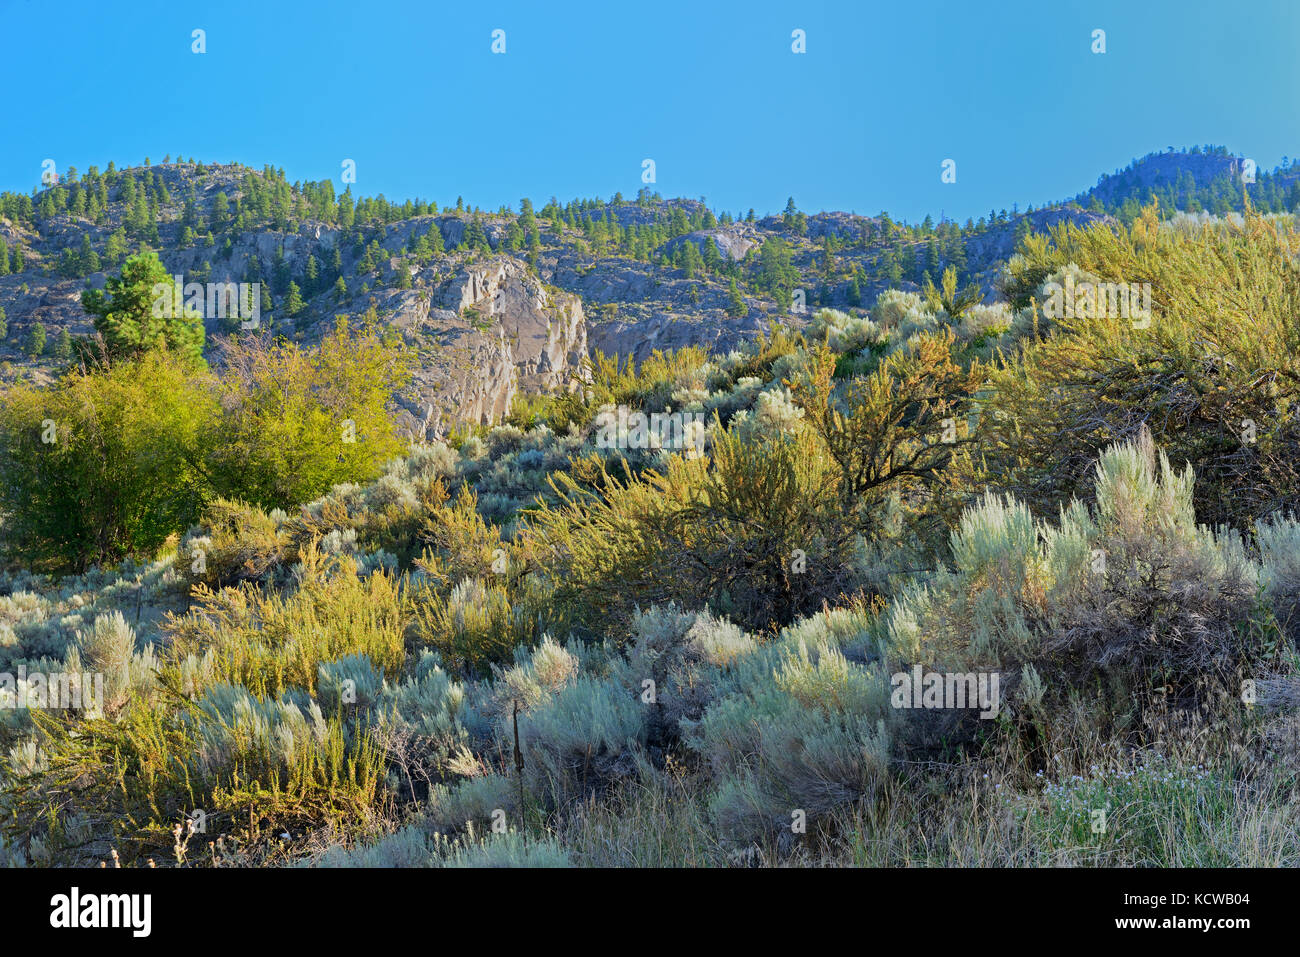 Sagebrush in Antelope-brush ecosystem, Okanagan Valley, Osoyoos, British Columbia, Canada - Stock Image